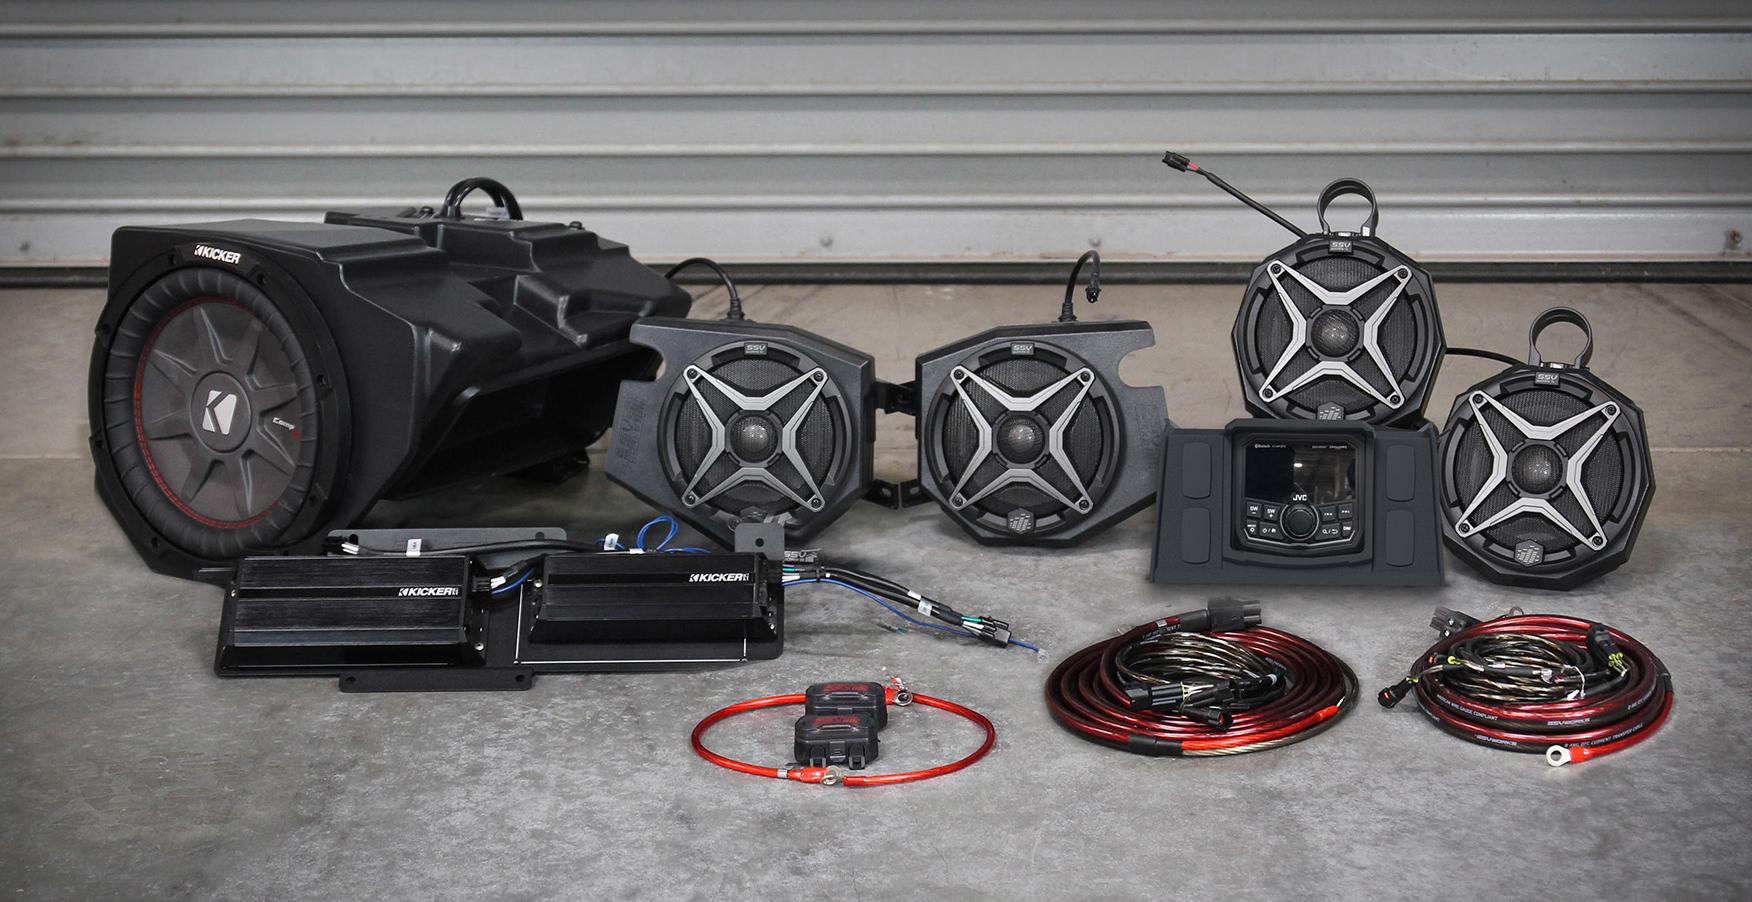 SSV Works 3- and 5-speaker kits with JVC backup-camera-ready radio